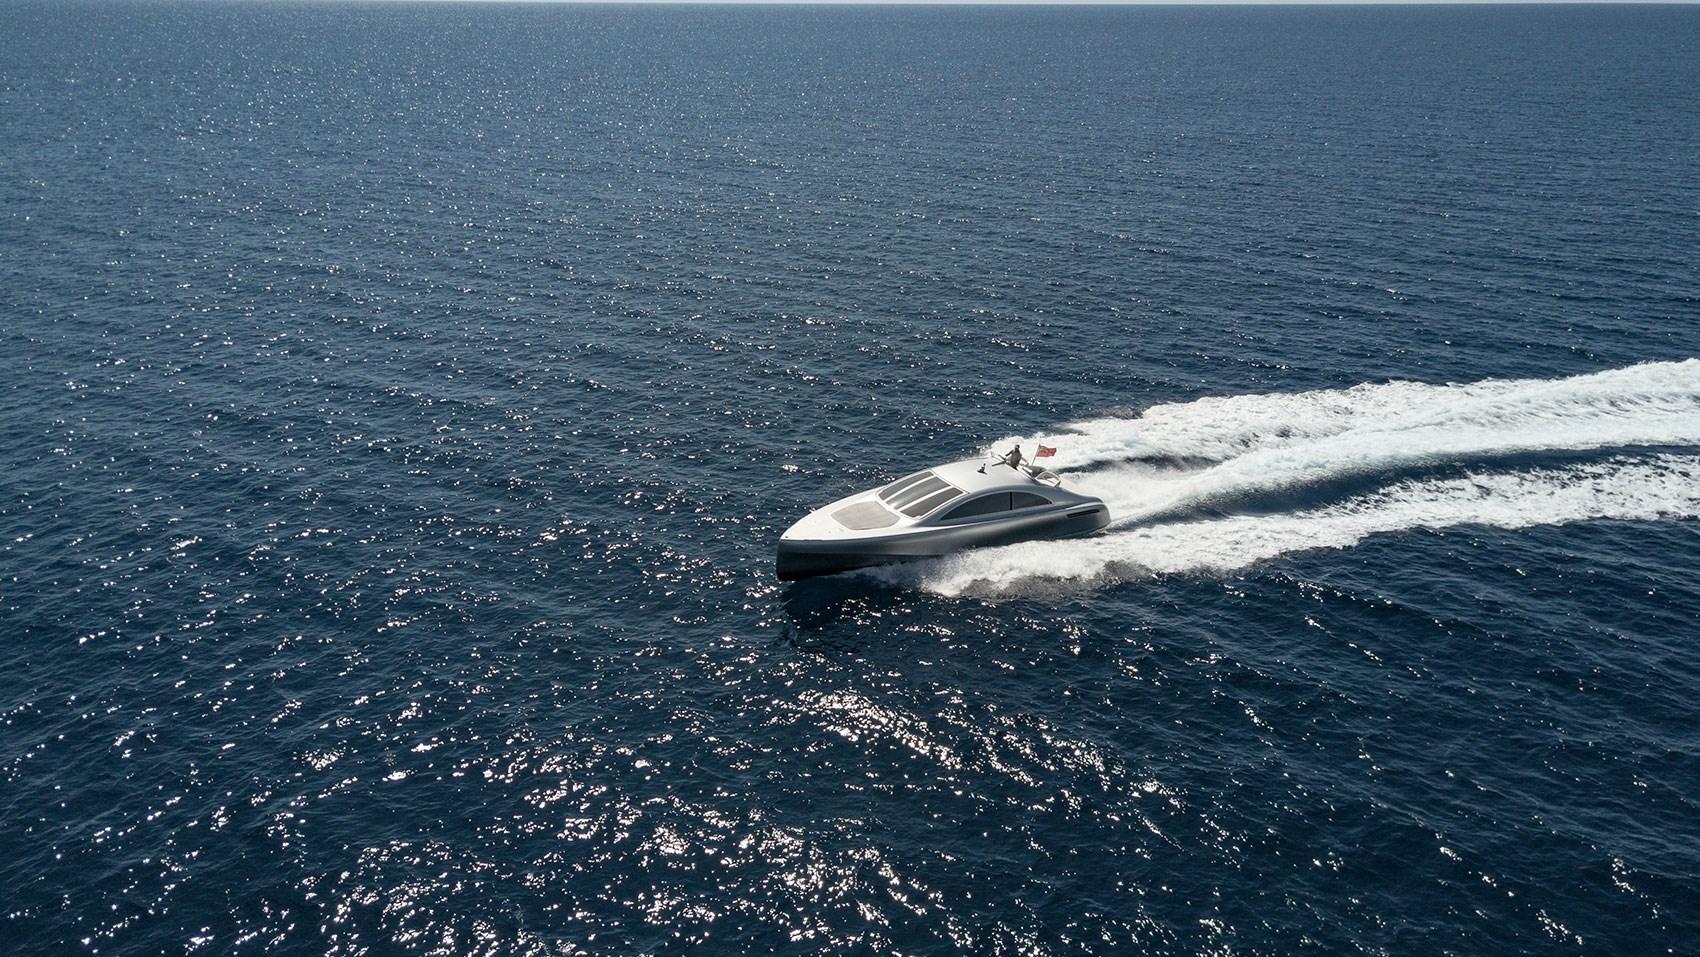 Mercedes Silver Arrow Marine Yacht: the £2 million 460-Granturismo at sea